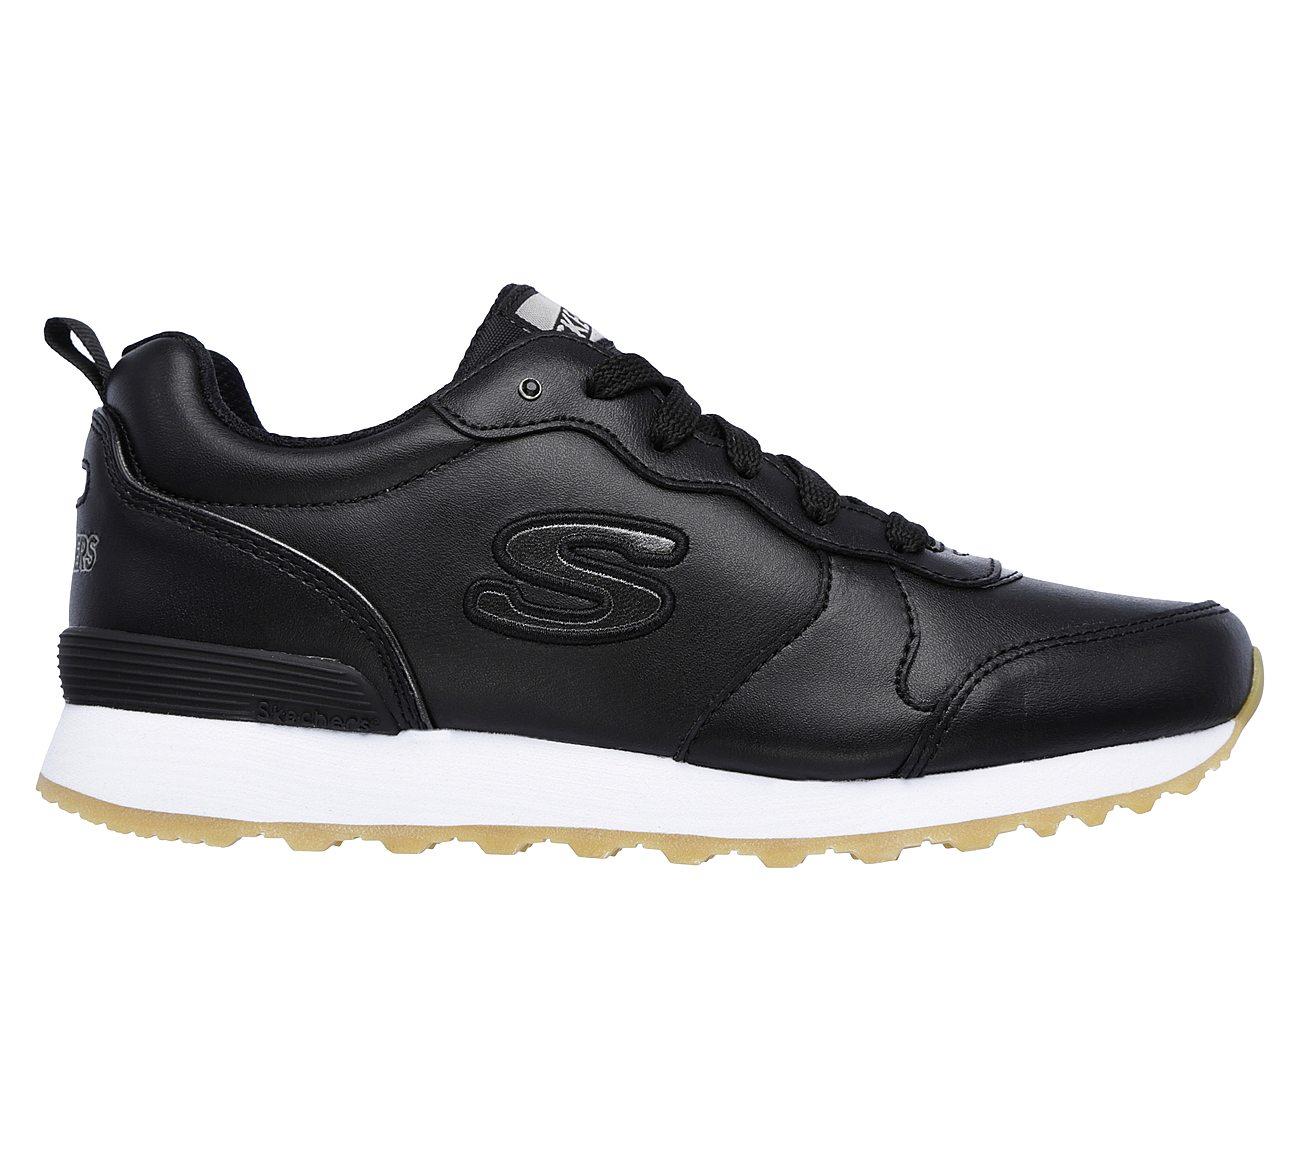 Womens Sneakers Bobs From Skechers OG 85 Street Sneak